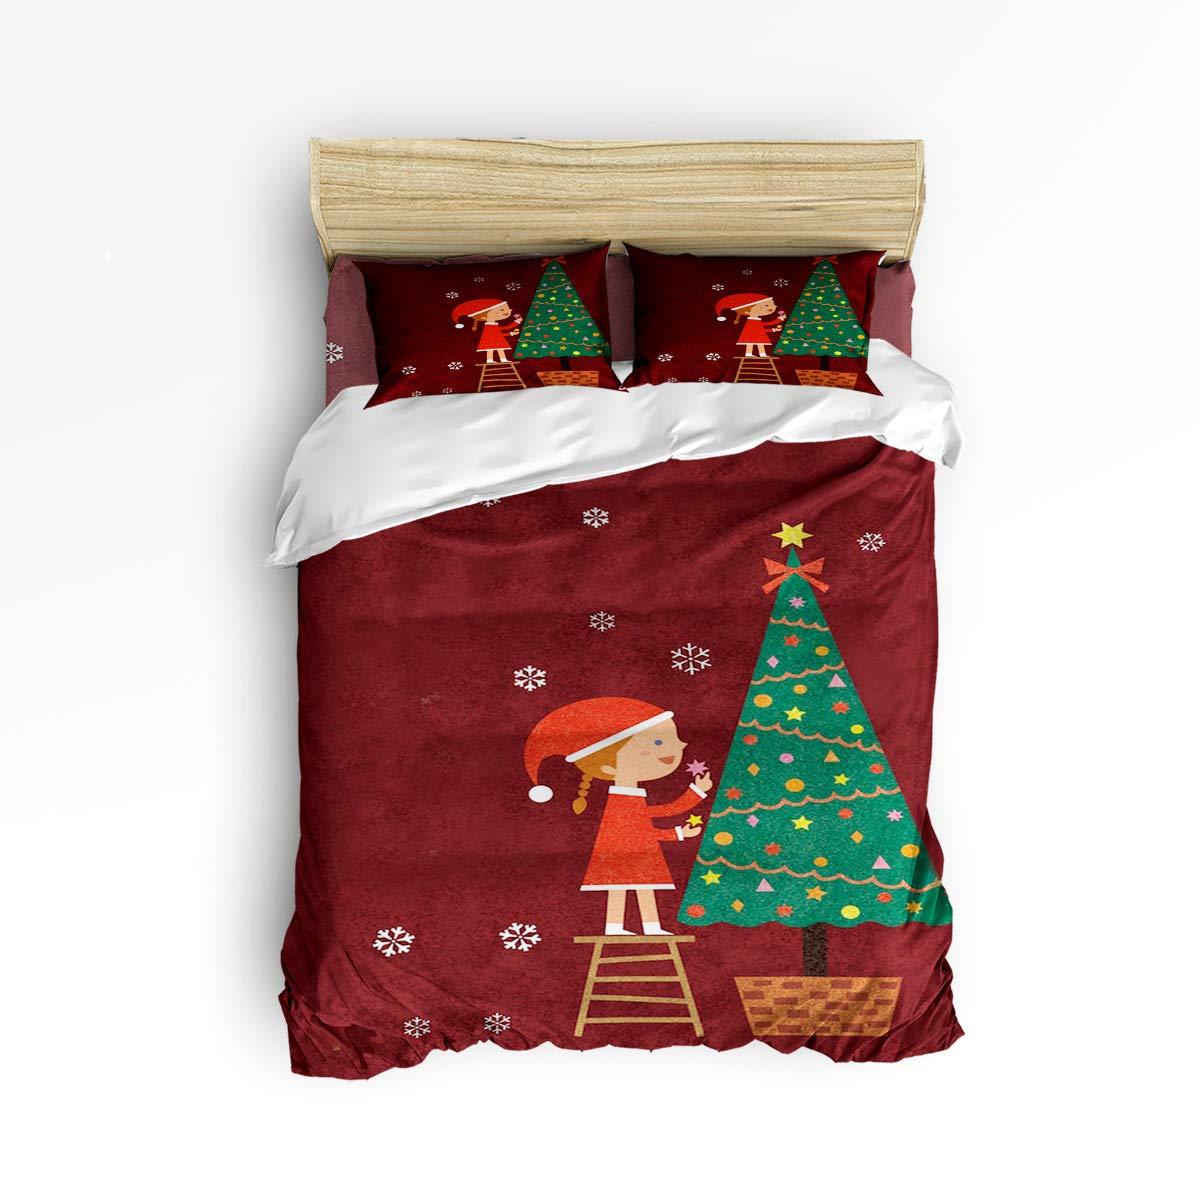 Anzona 寝具4点セット クリスマスガール 椅子に立つ クリスマスツリー 装飾オーナメント 羽毛布団カバー4点セット ベッドスプレッド デイベッド 子供/子供/ティーン/大人用 King Size 181022-zly4pcsbeds-SWTQ00411SJTDAZN B07JQD2TQC Christmastree4azn7236 King Size